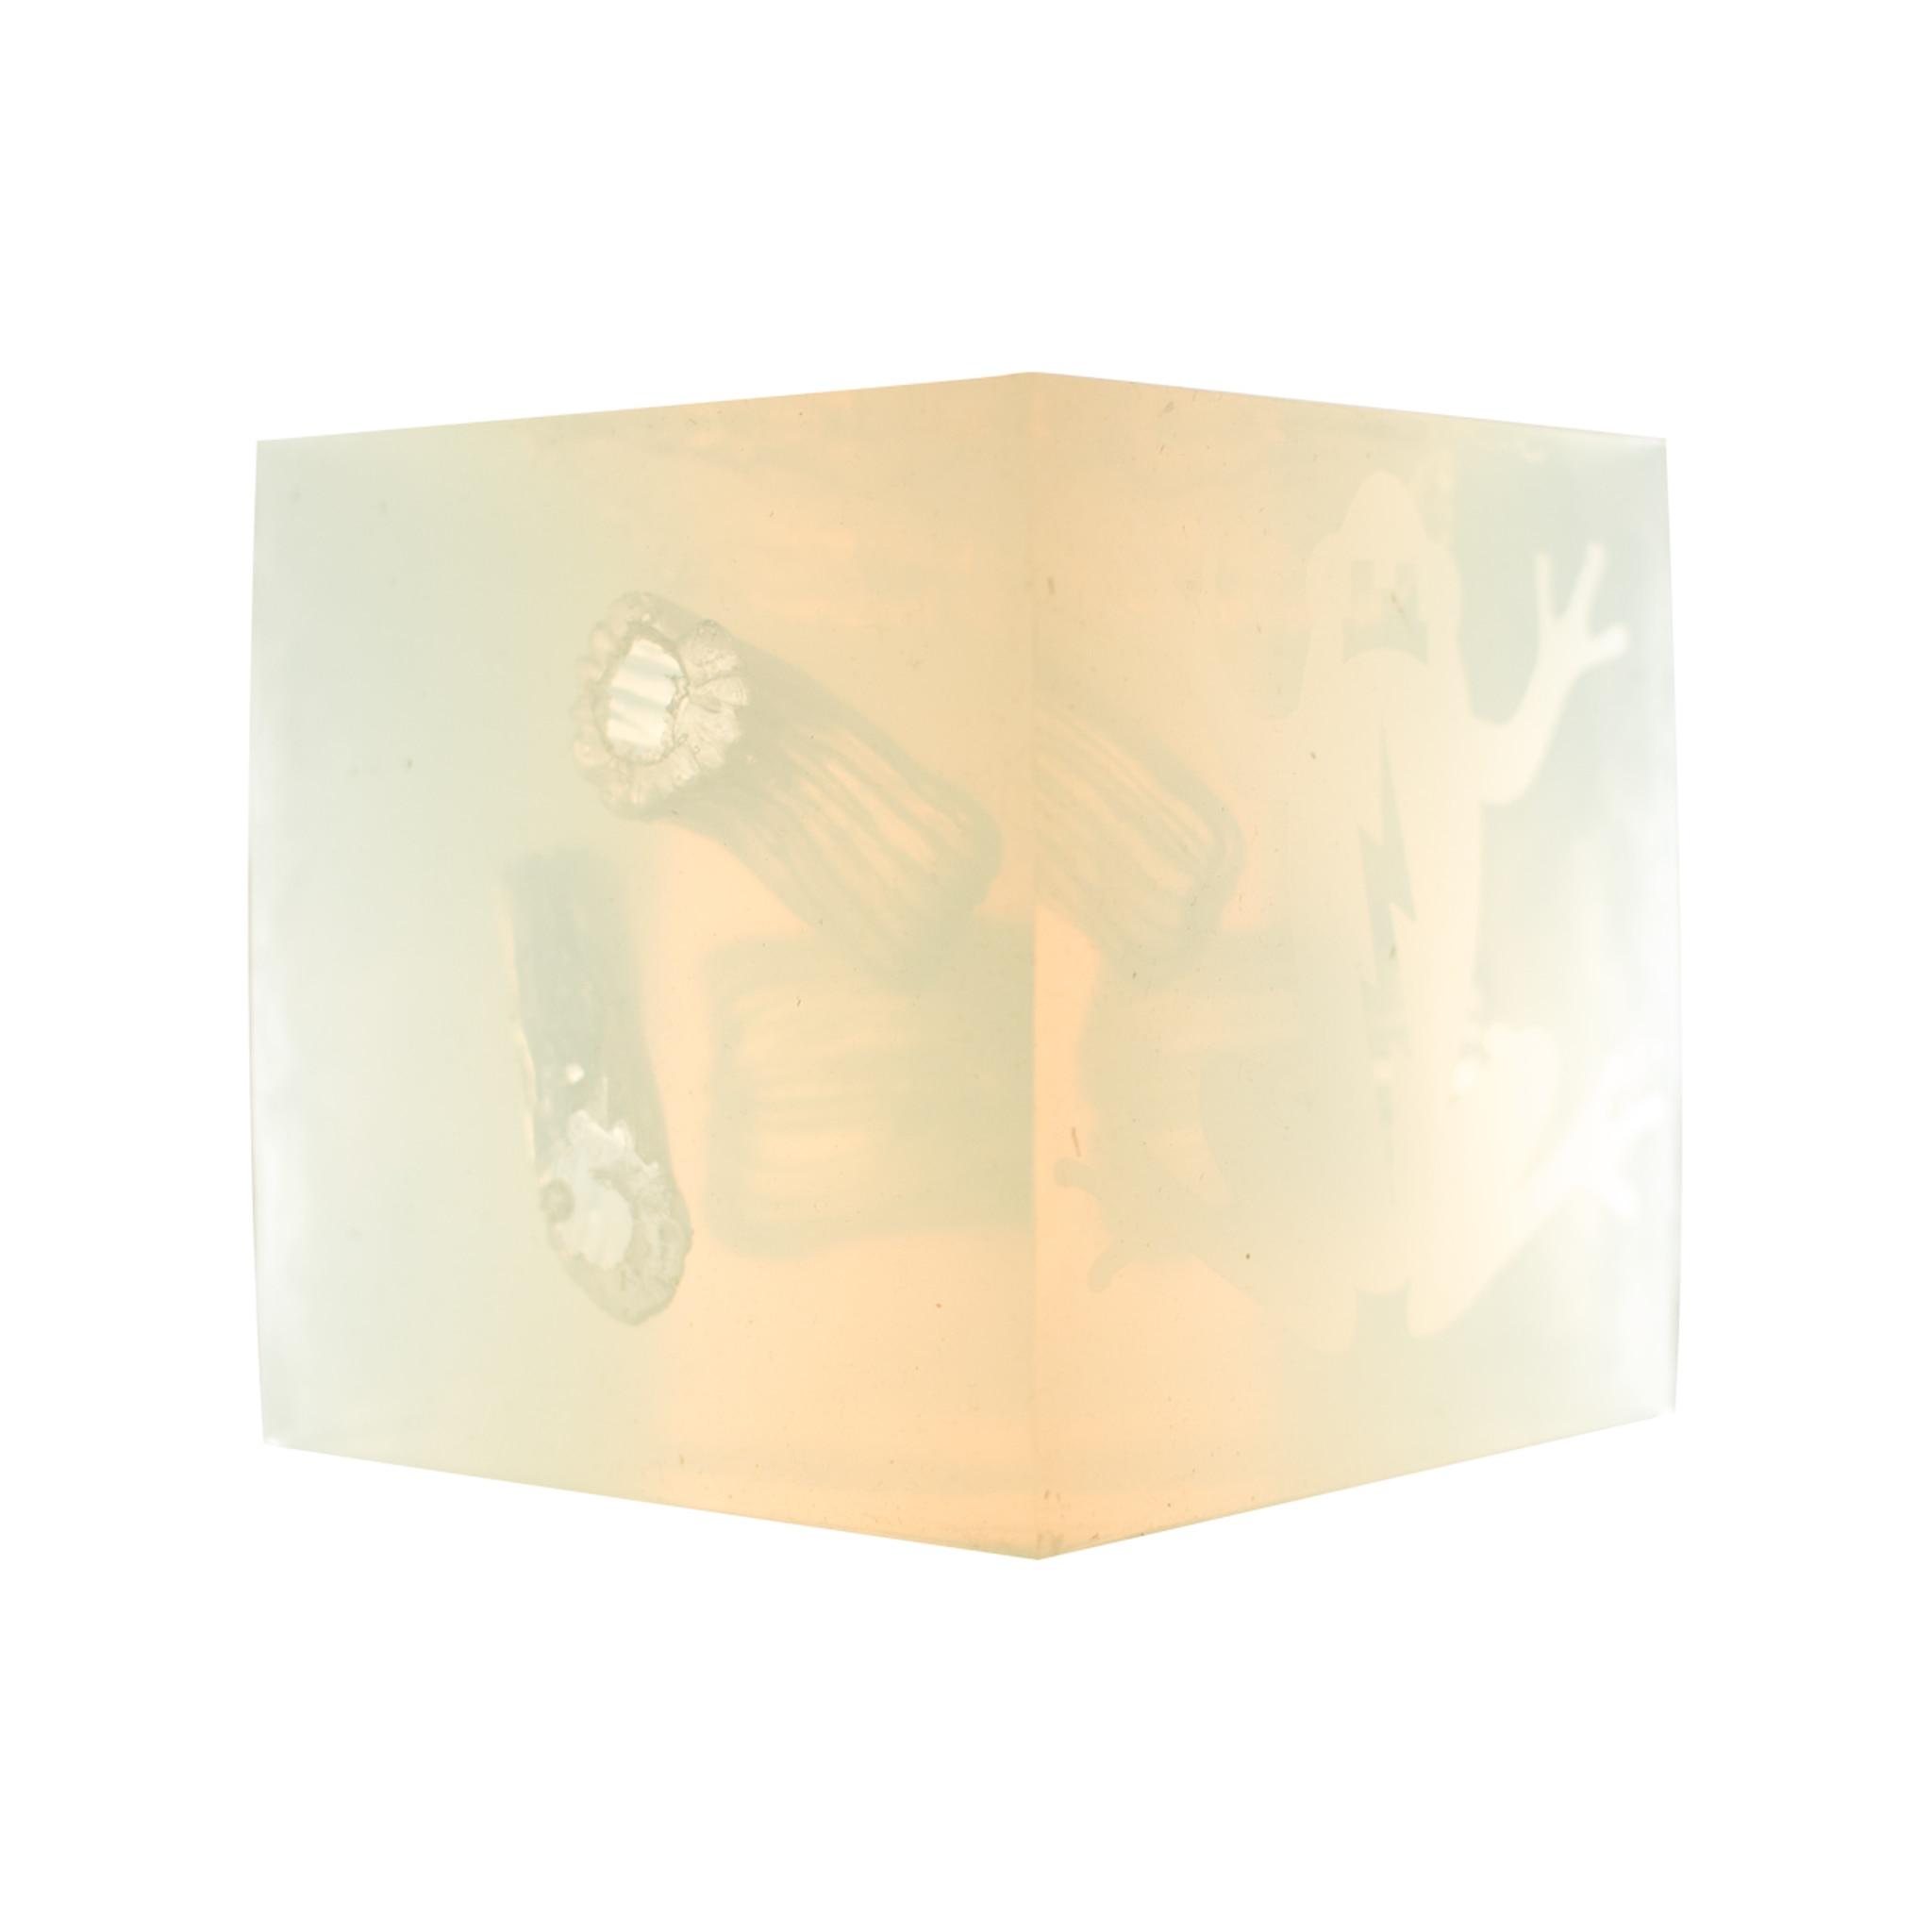 Wound Cube ™ Wound Simulator